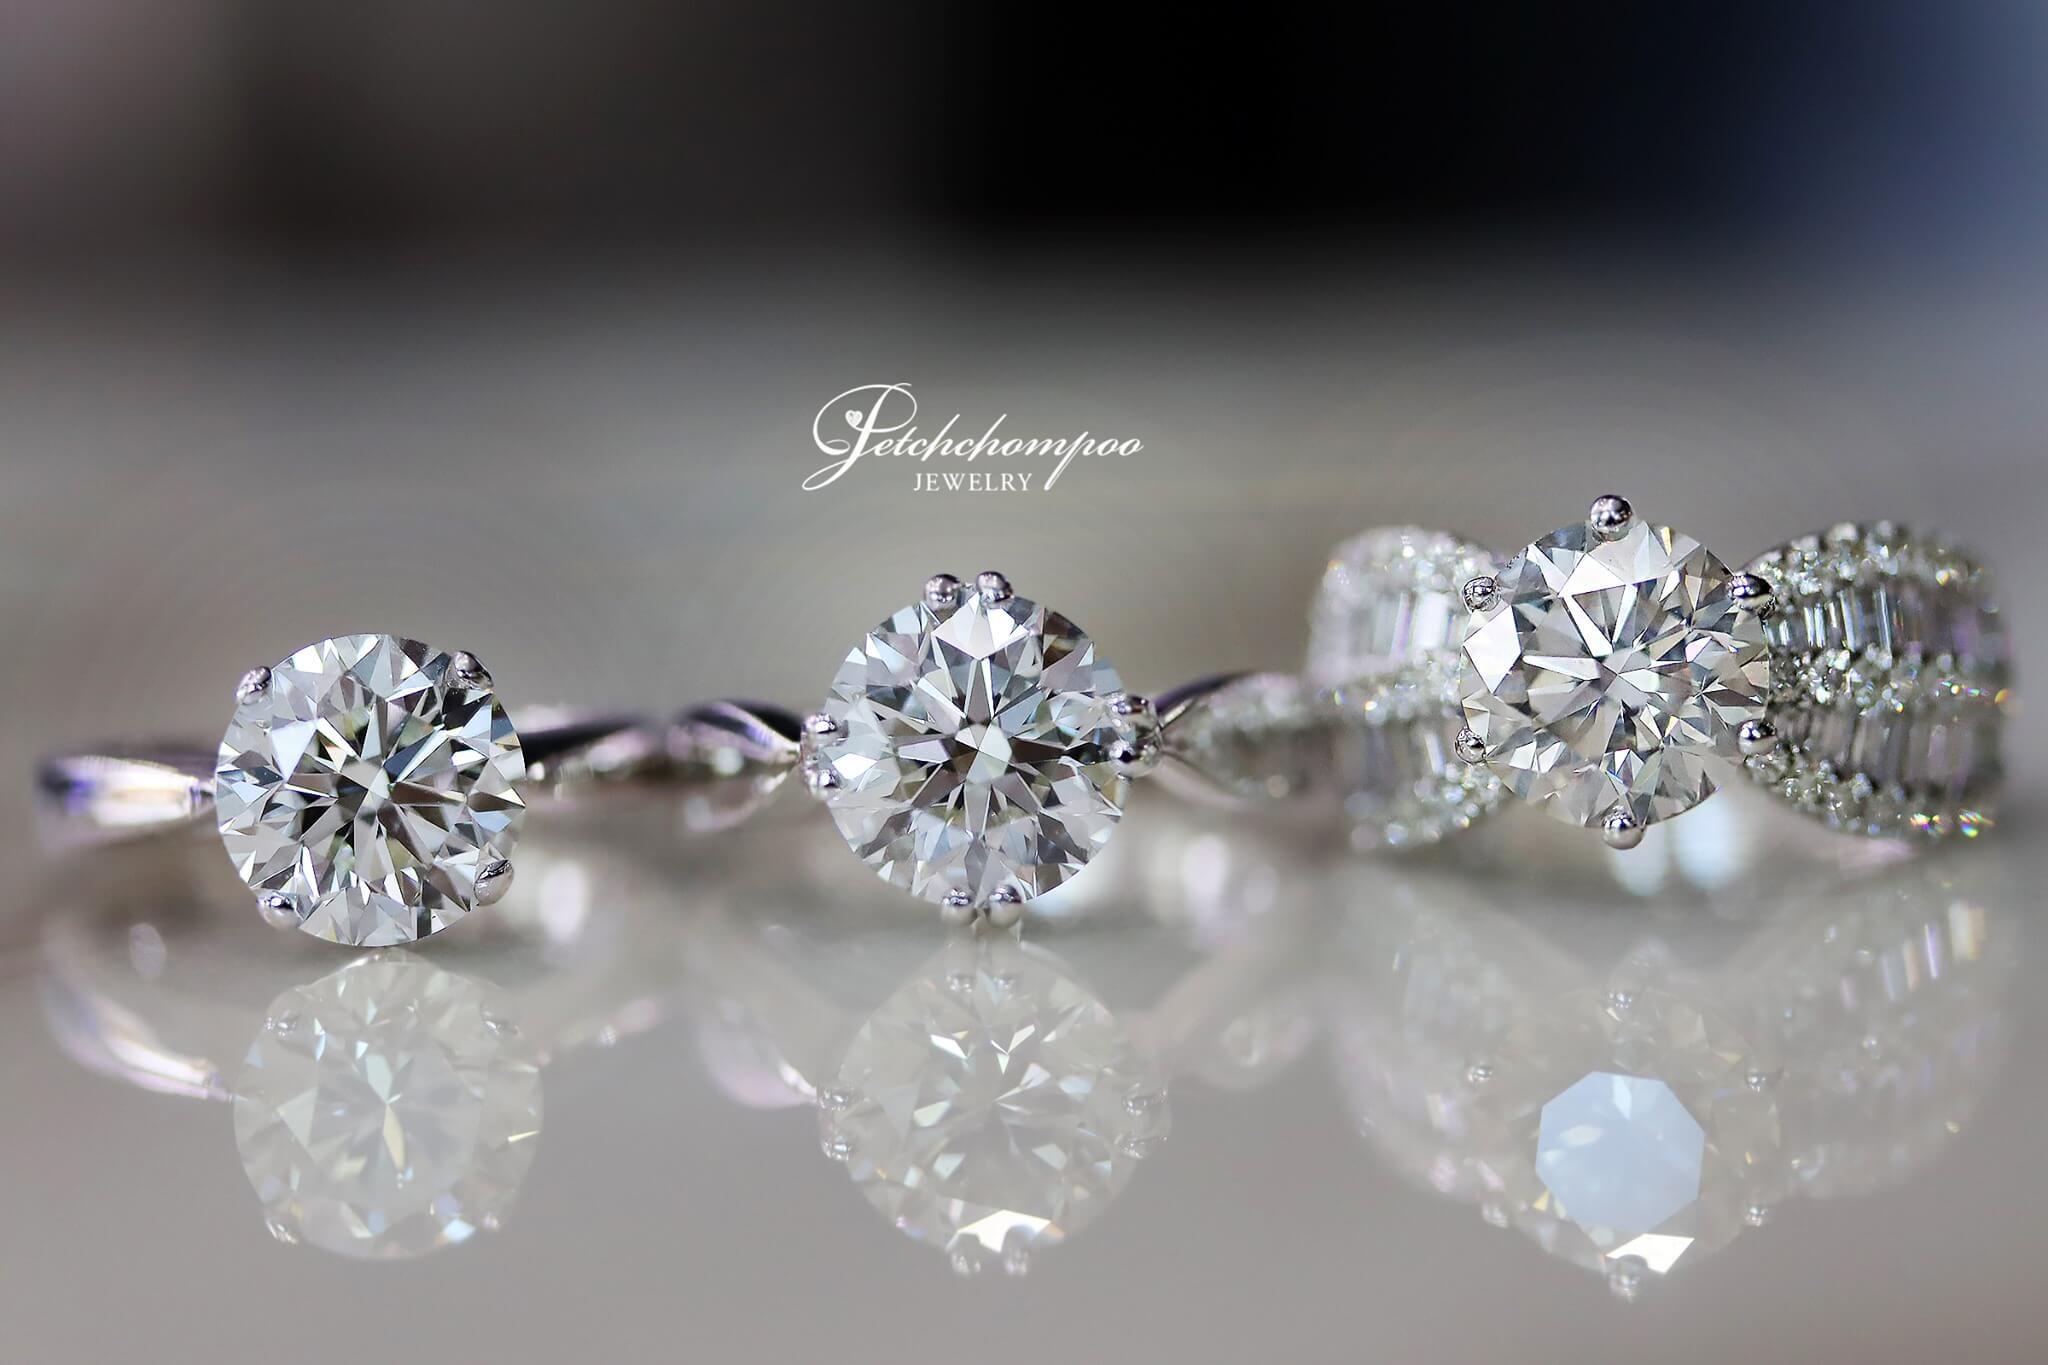 Petchchompoo Jewelry แหวนเพชรแท้ - ร้านเพชรชมพู จิวเวลรี่